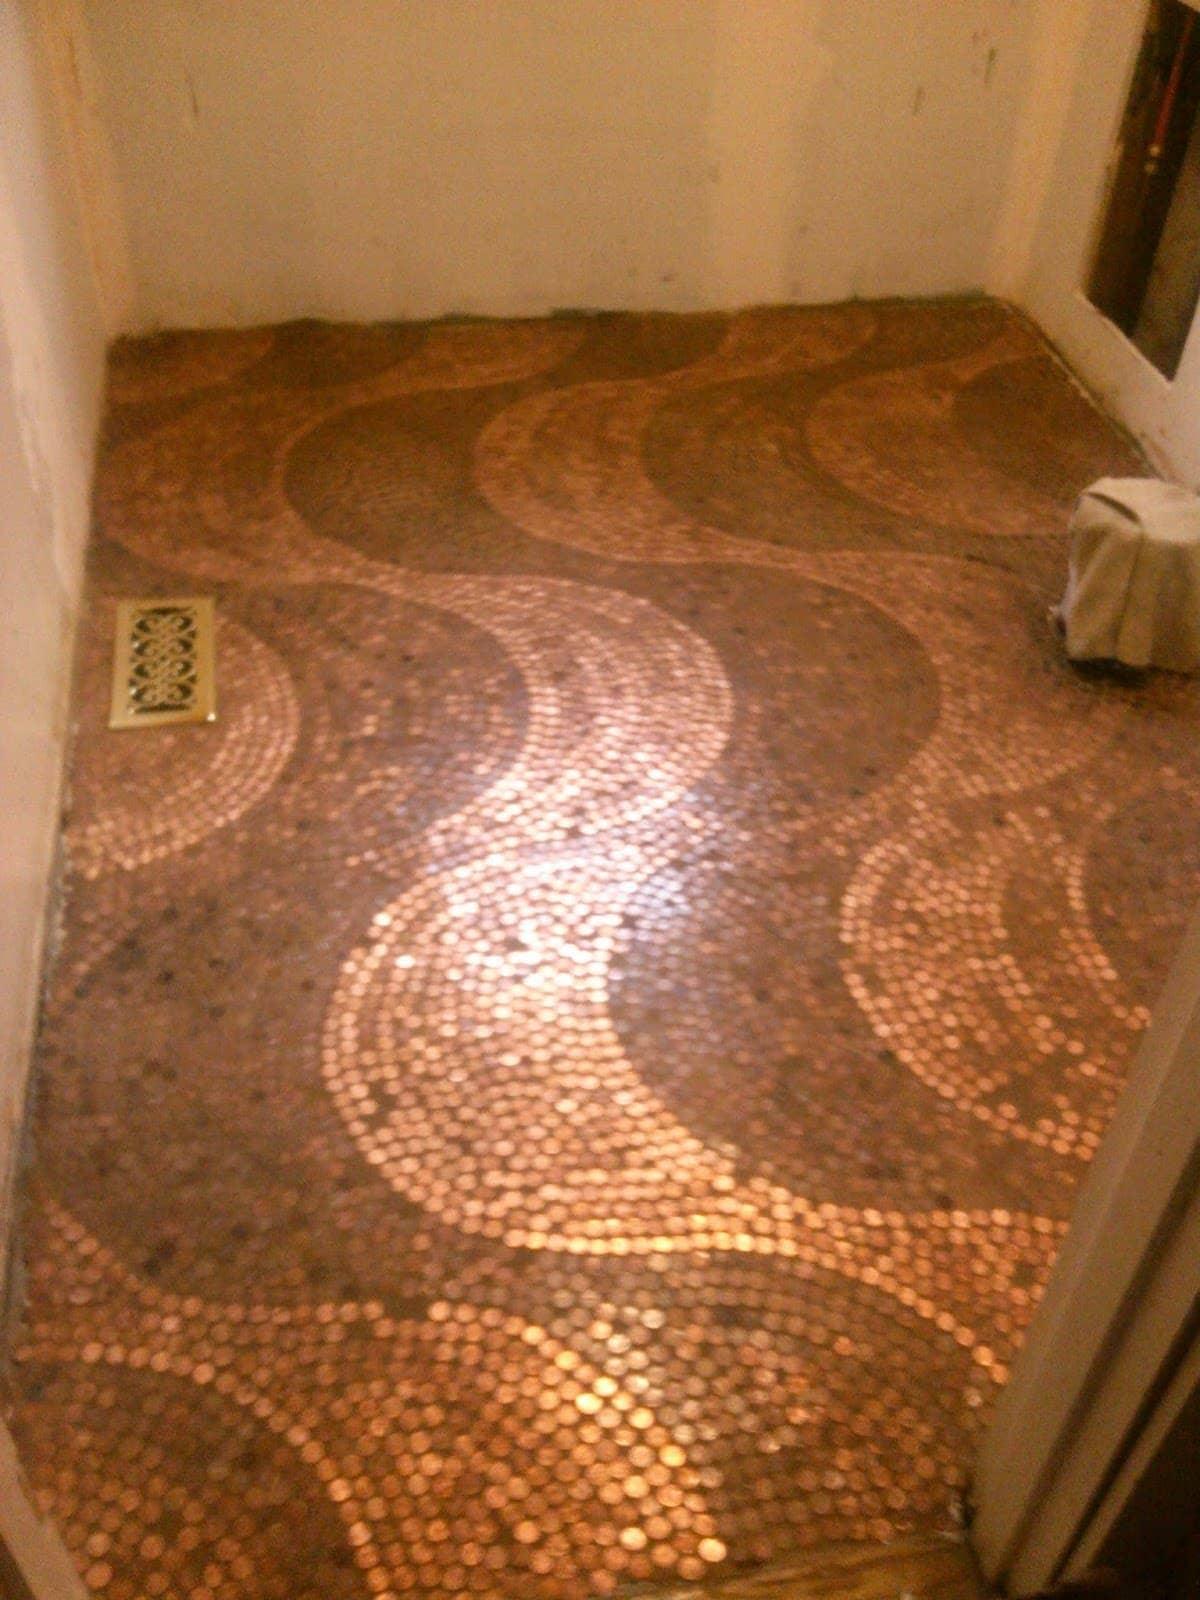 Penny flooring idea